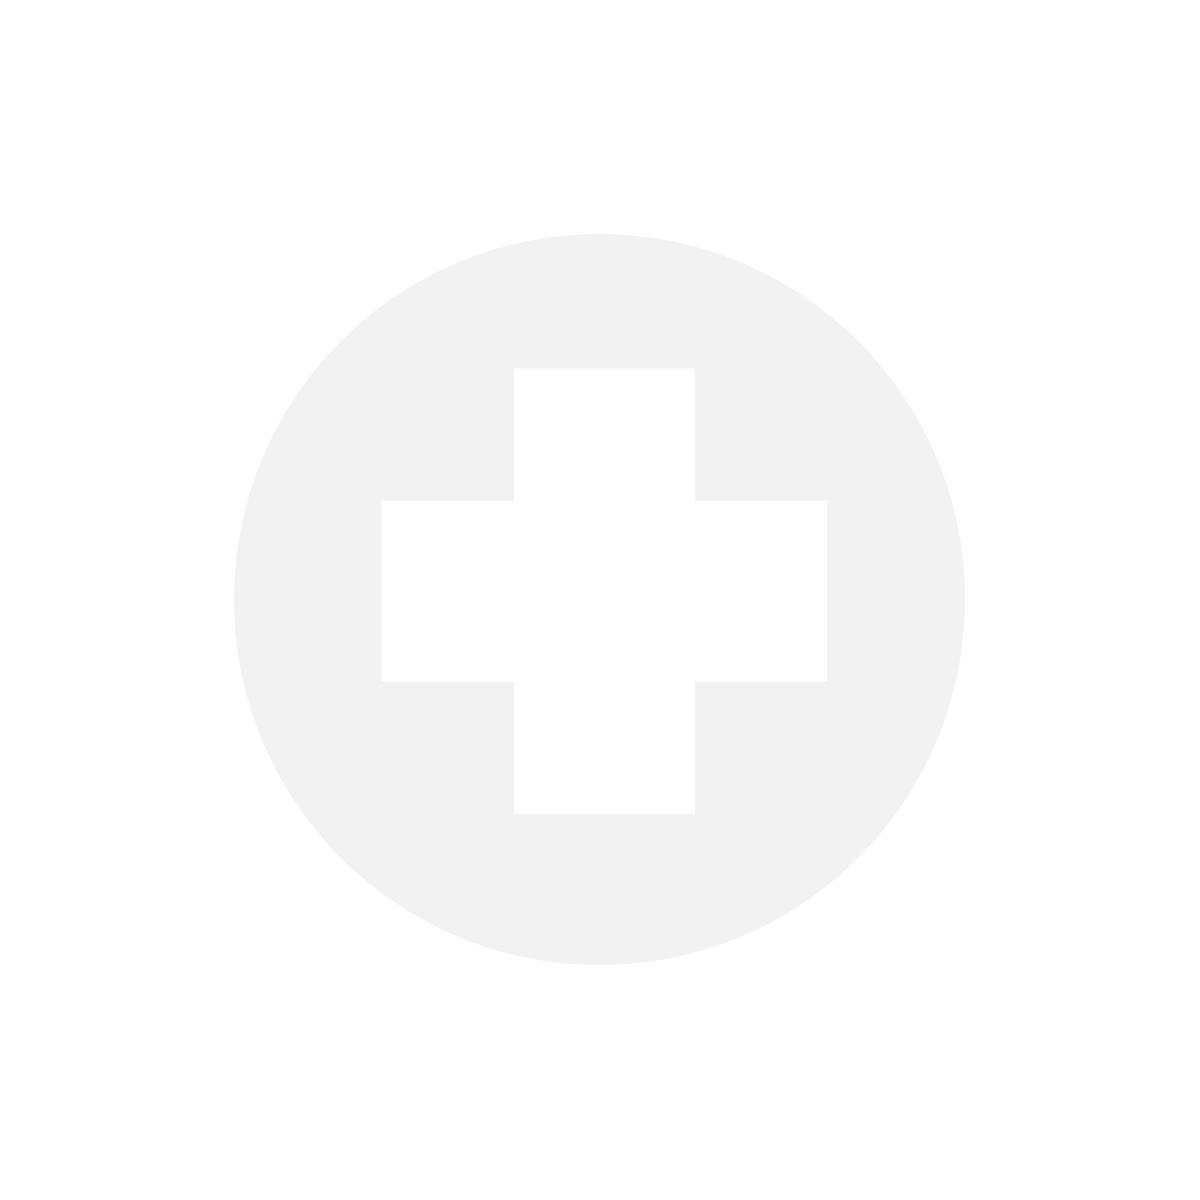 Batterie pour Myo Max 4, Rehab 4, Acus 4, Myo Activ 4